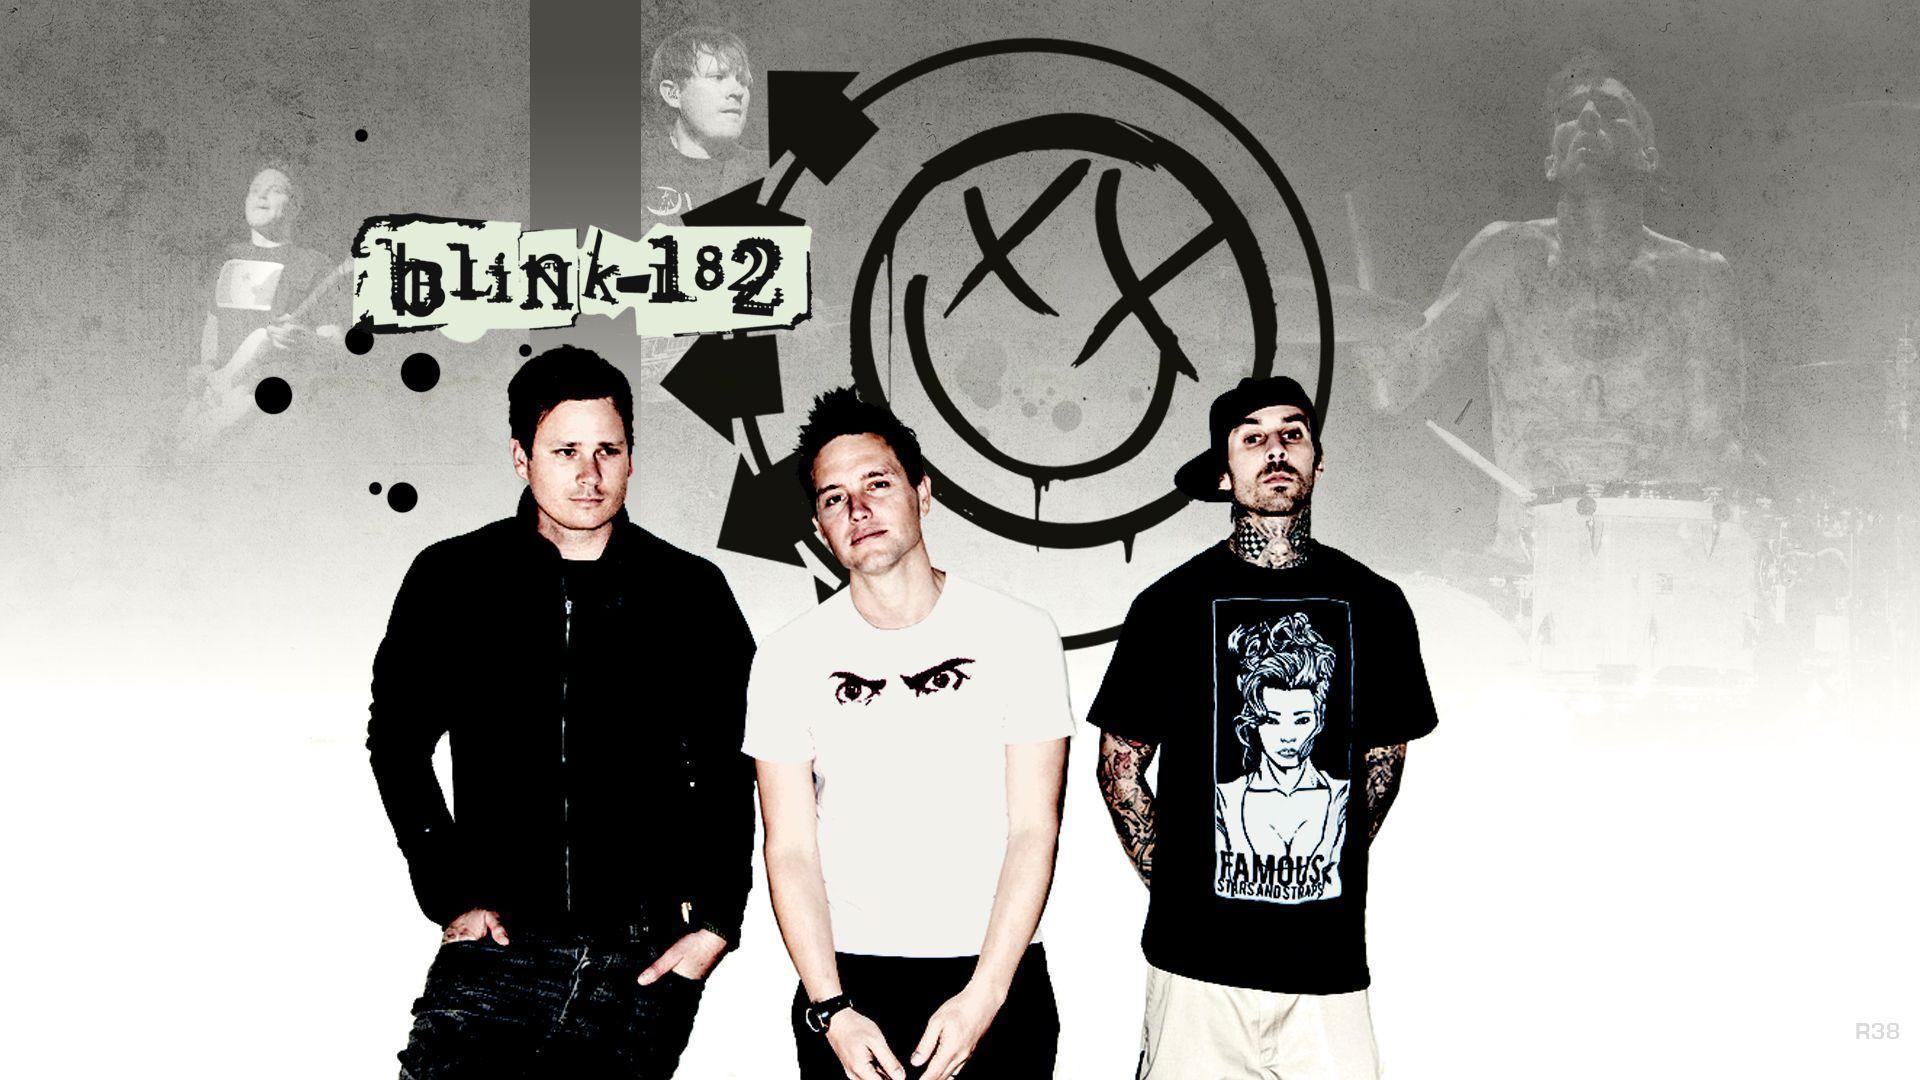 Blink 182 Wallpapers - Wallpaper Cave